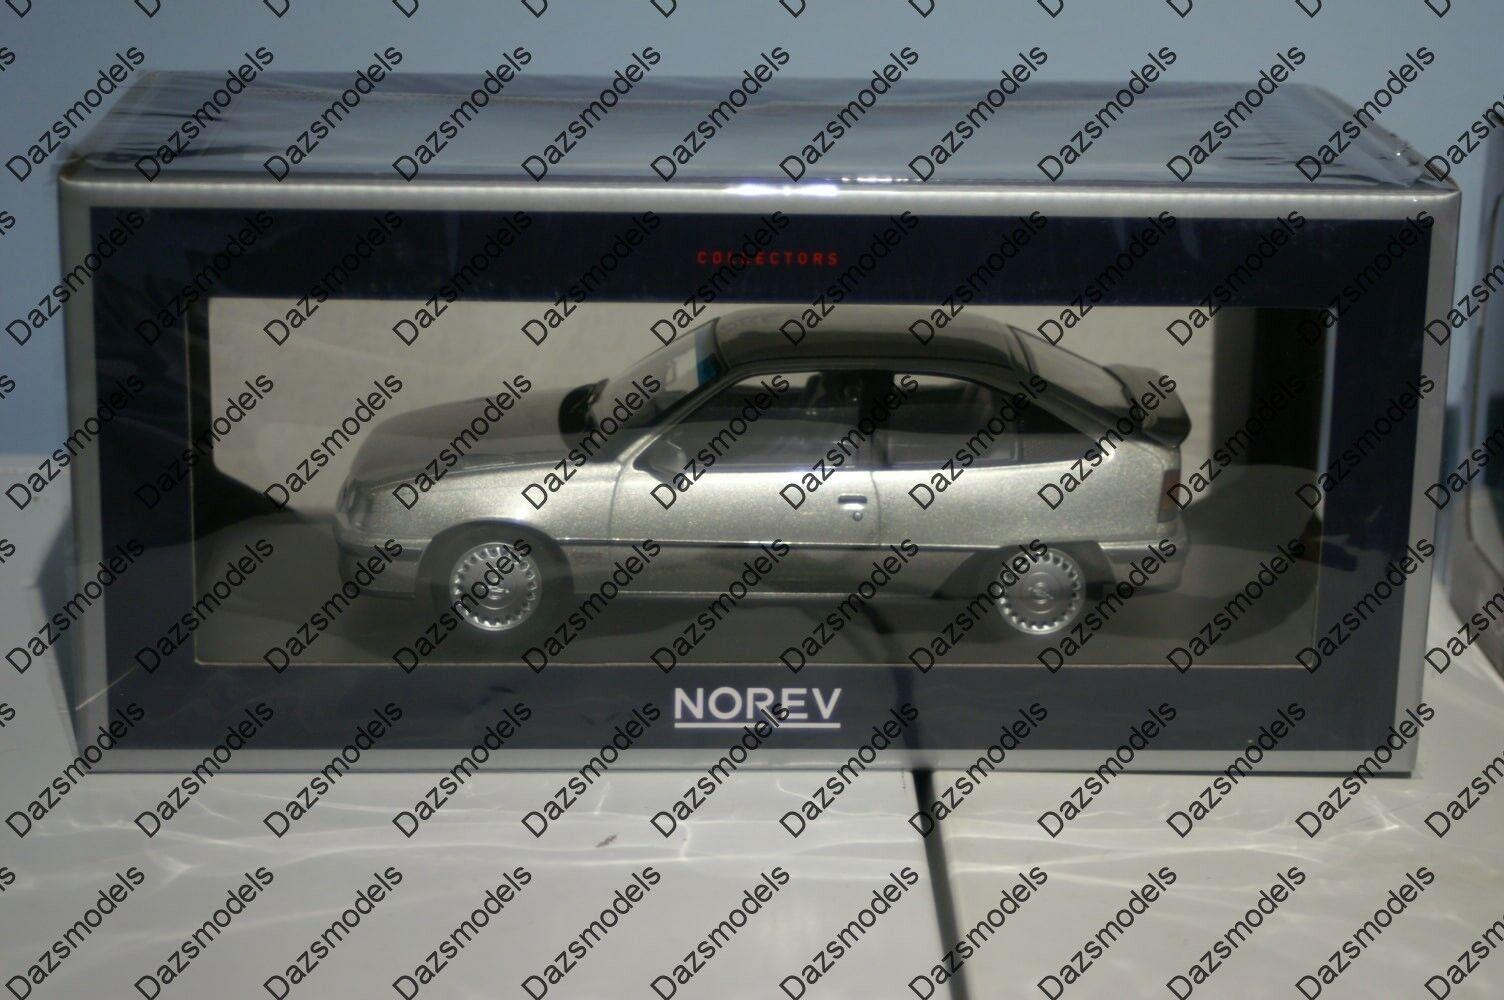 Norev Opel Kadett E GSI, Vauxhall Astra Mk2 argento 1 18 escala 183613